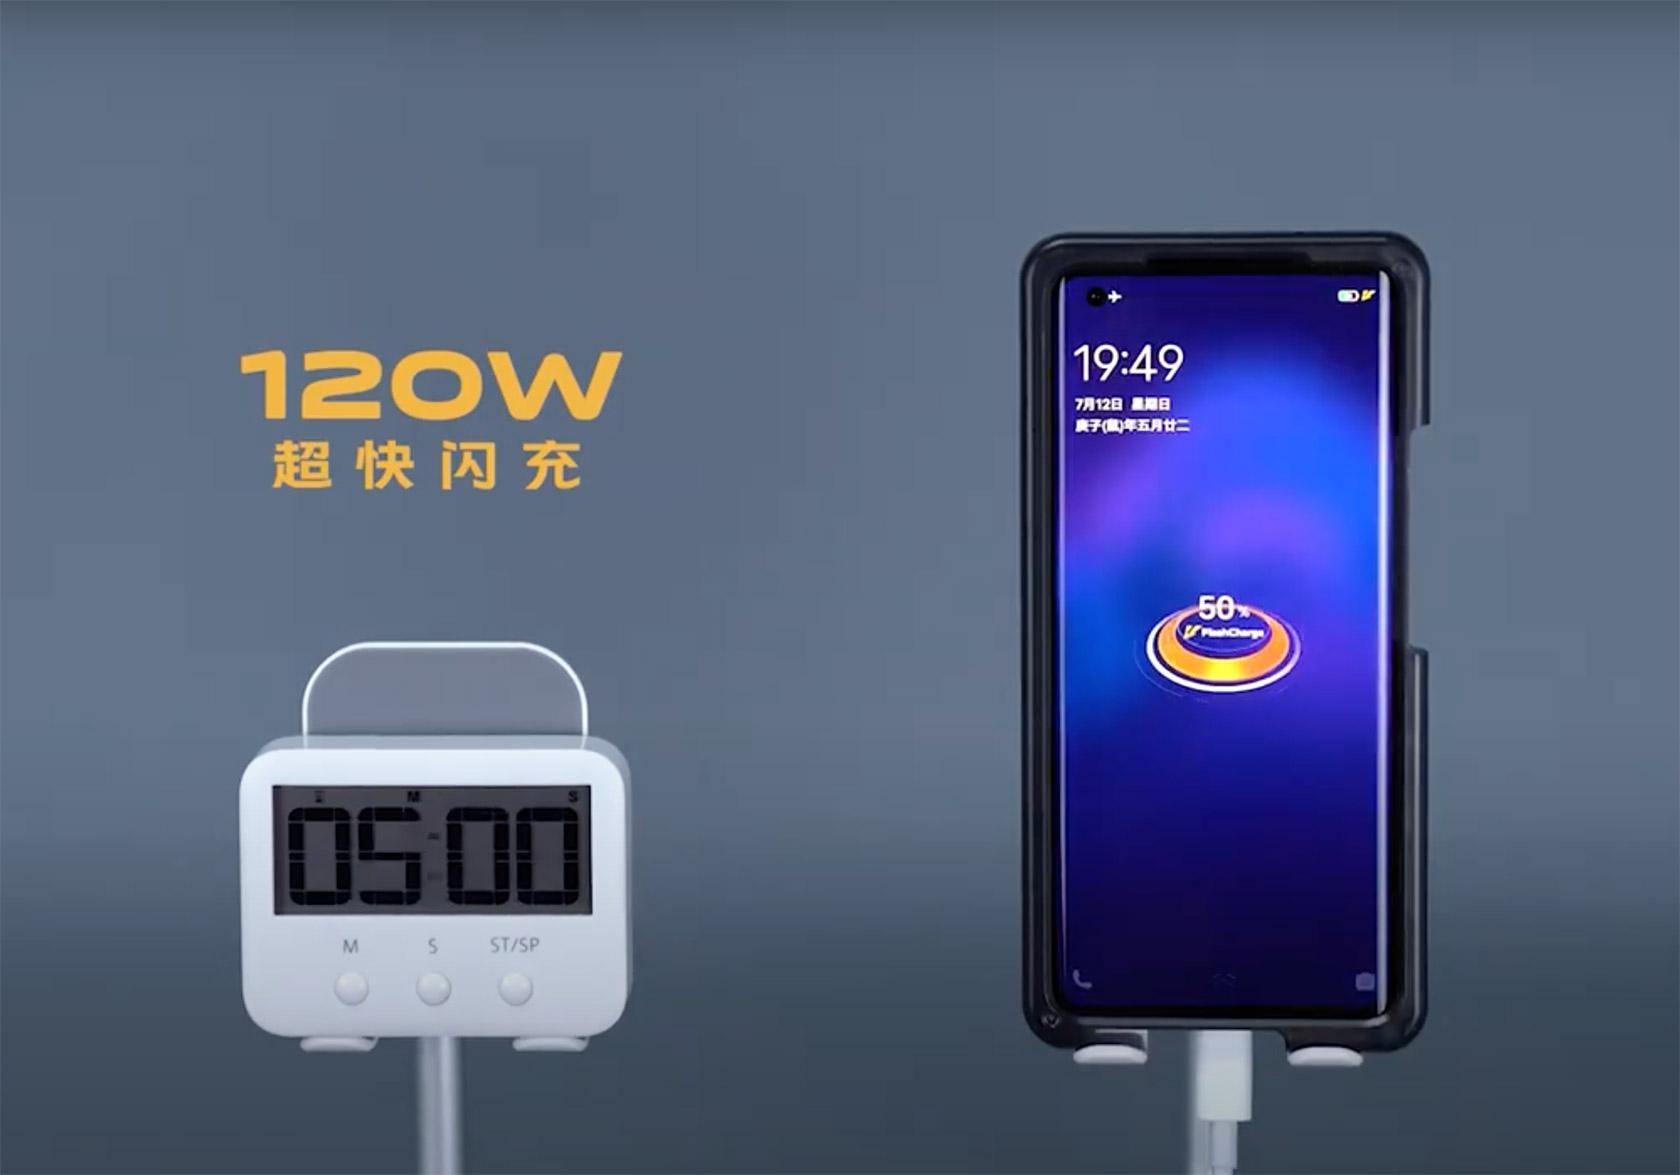 Vivo iQOO Gaming Smartphone 120W Fast Charging